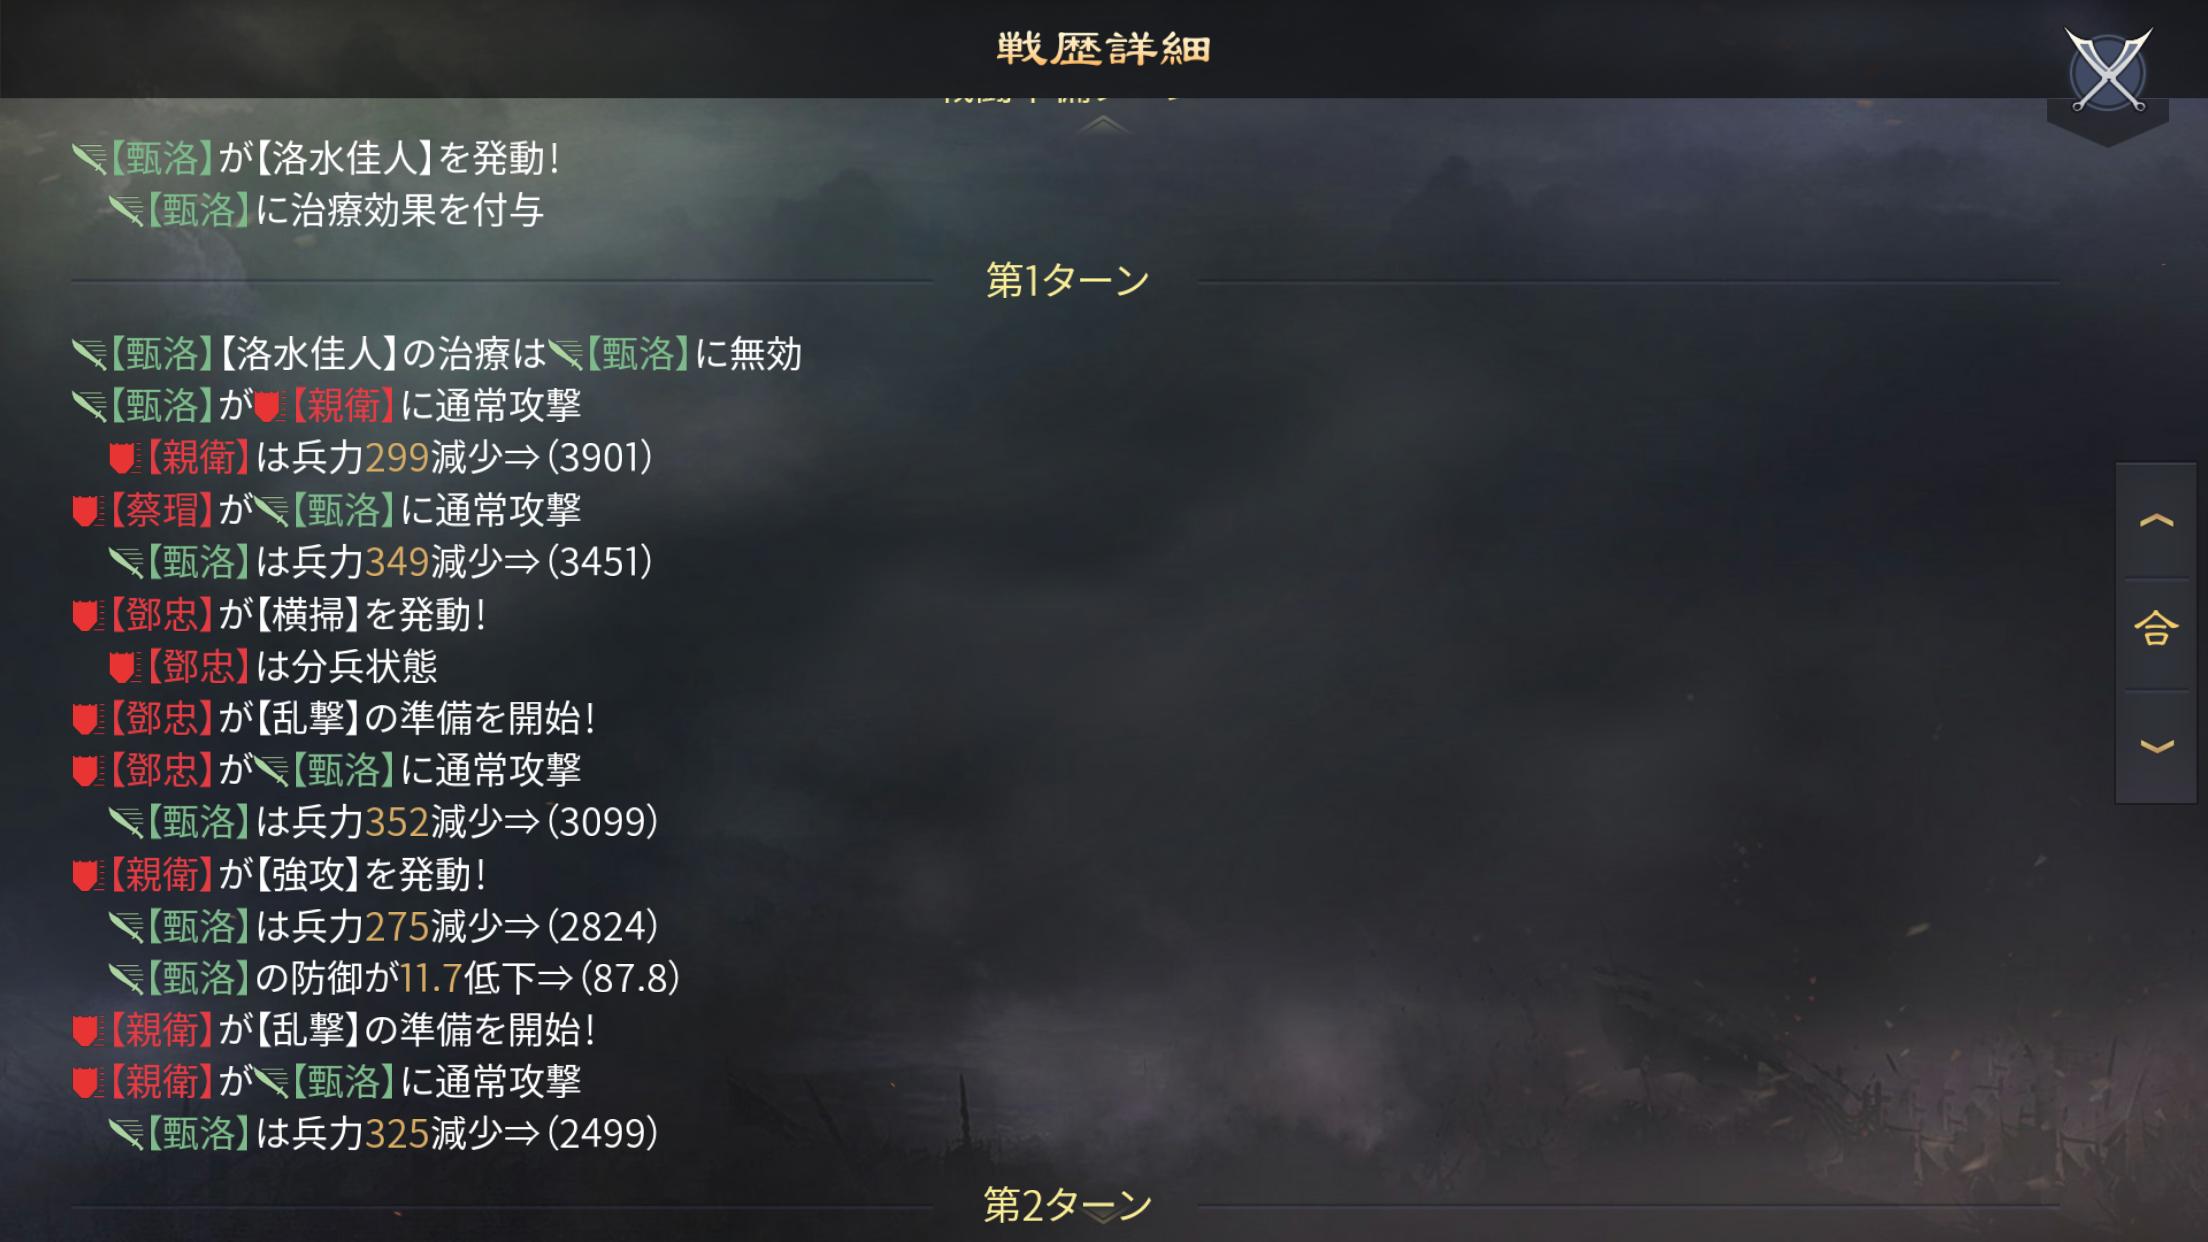 f:id:daisangokushimomimomi:20200327181103p:image